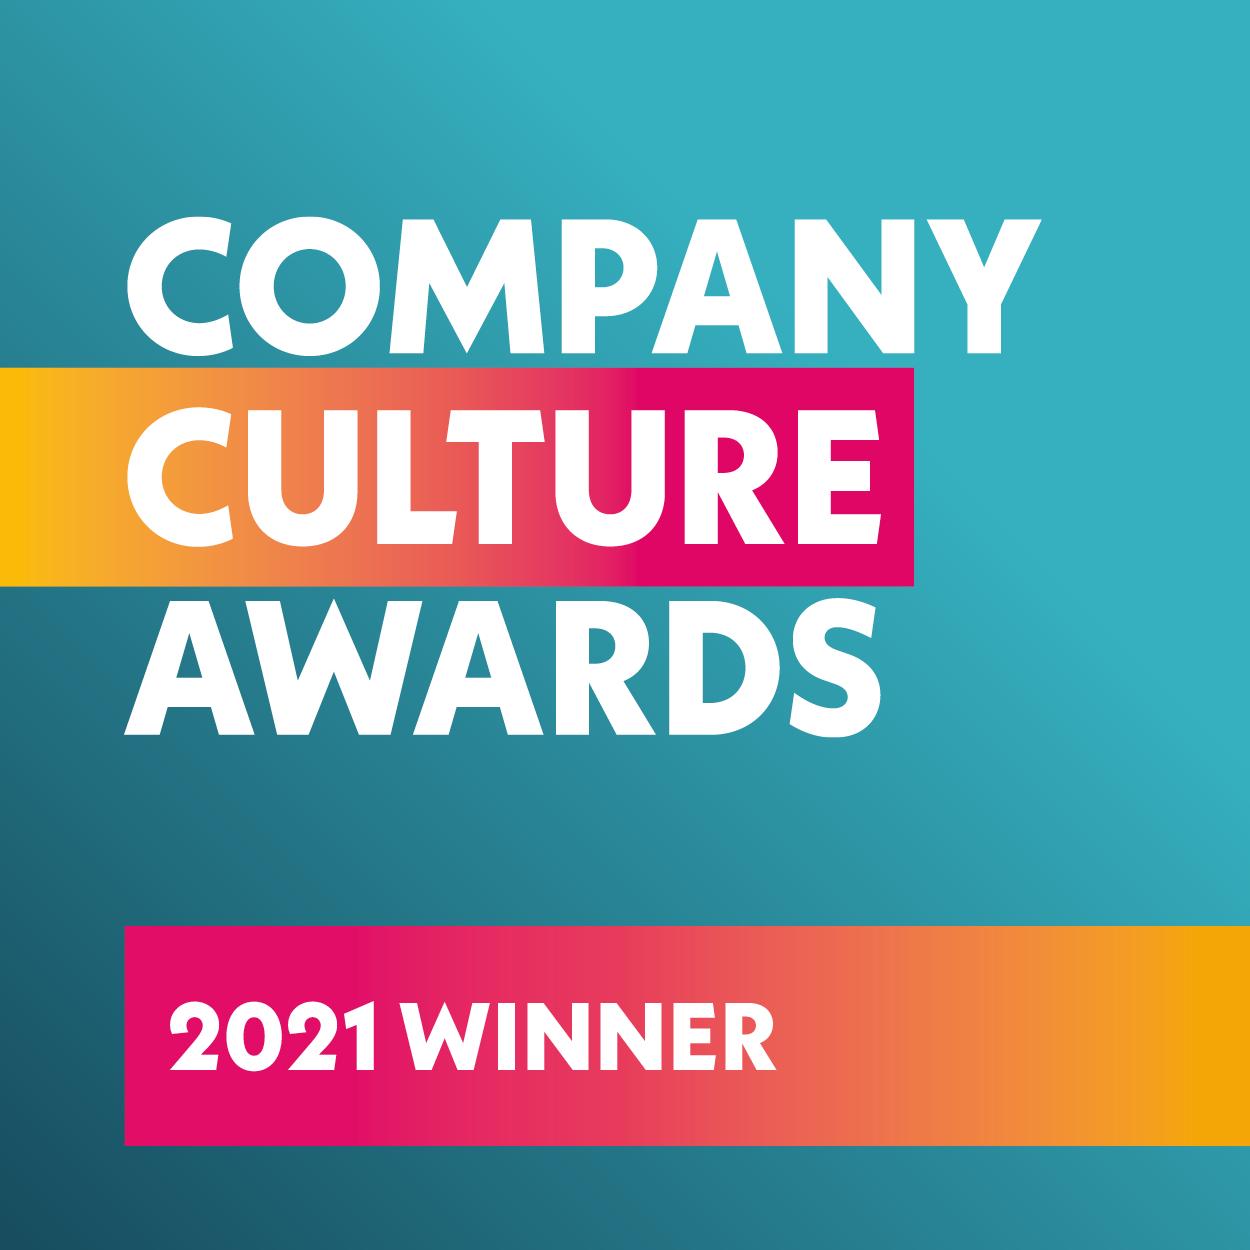 Company Culture Awards 2021 - Winner Badge